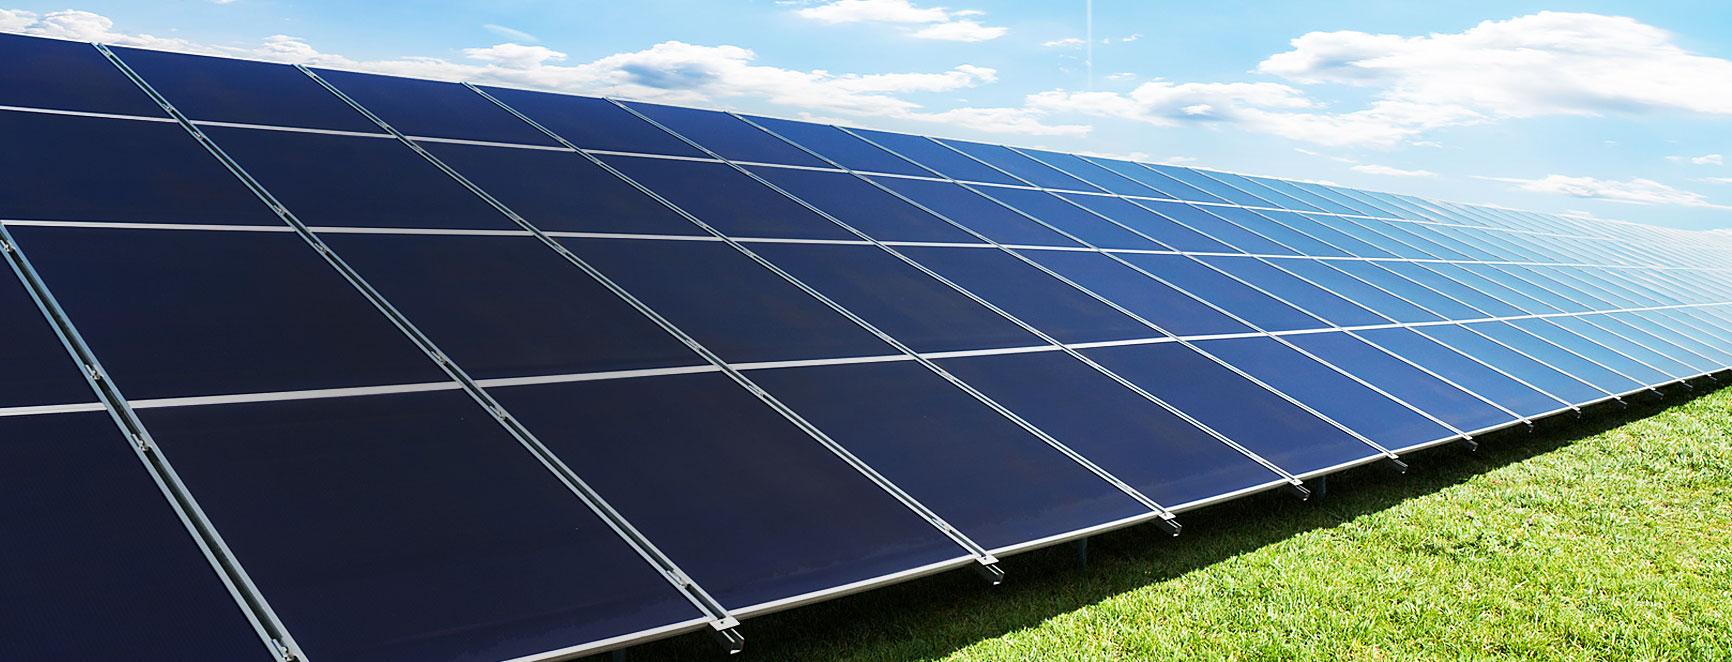 photovoltaics-slide2